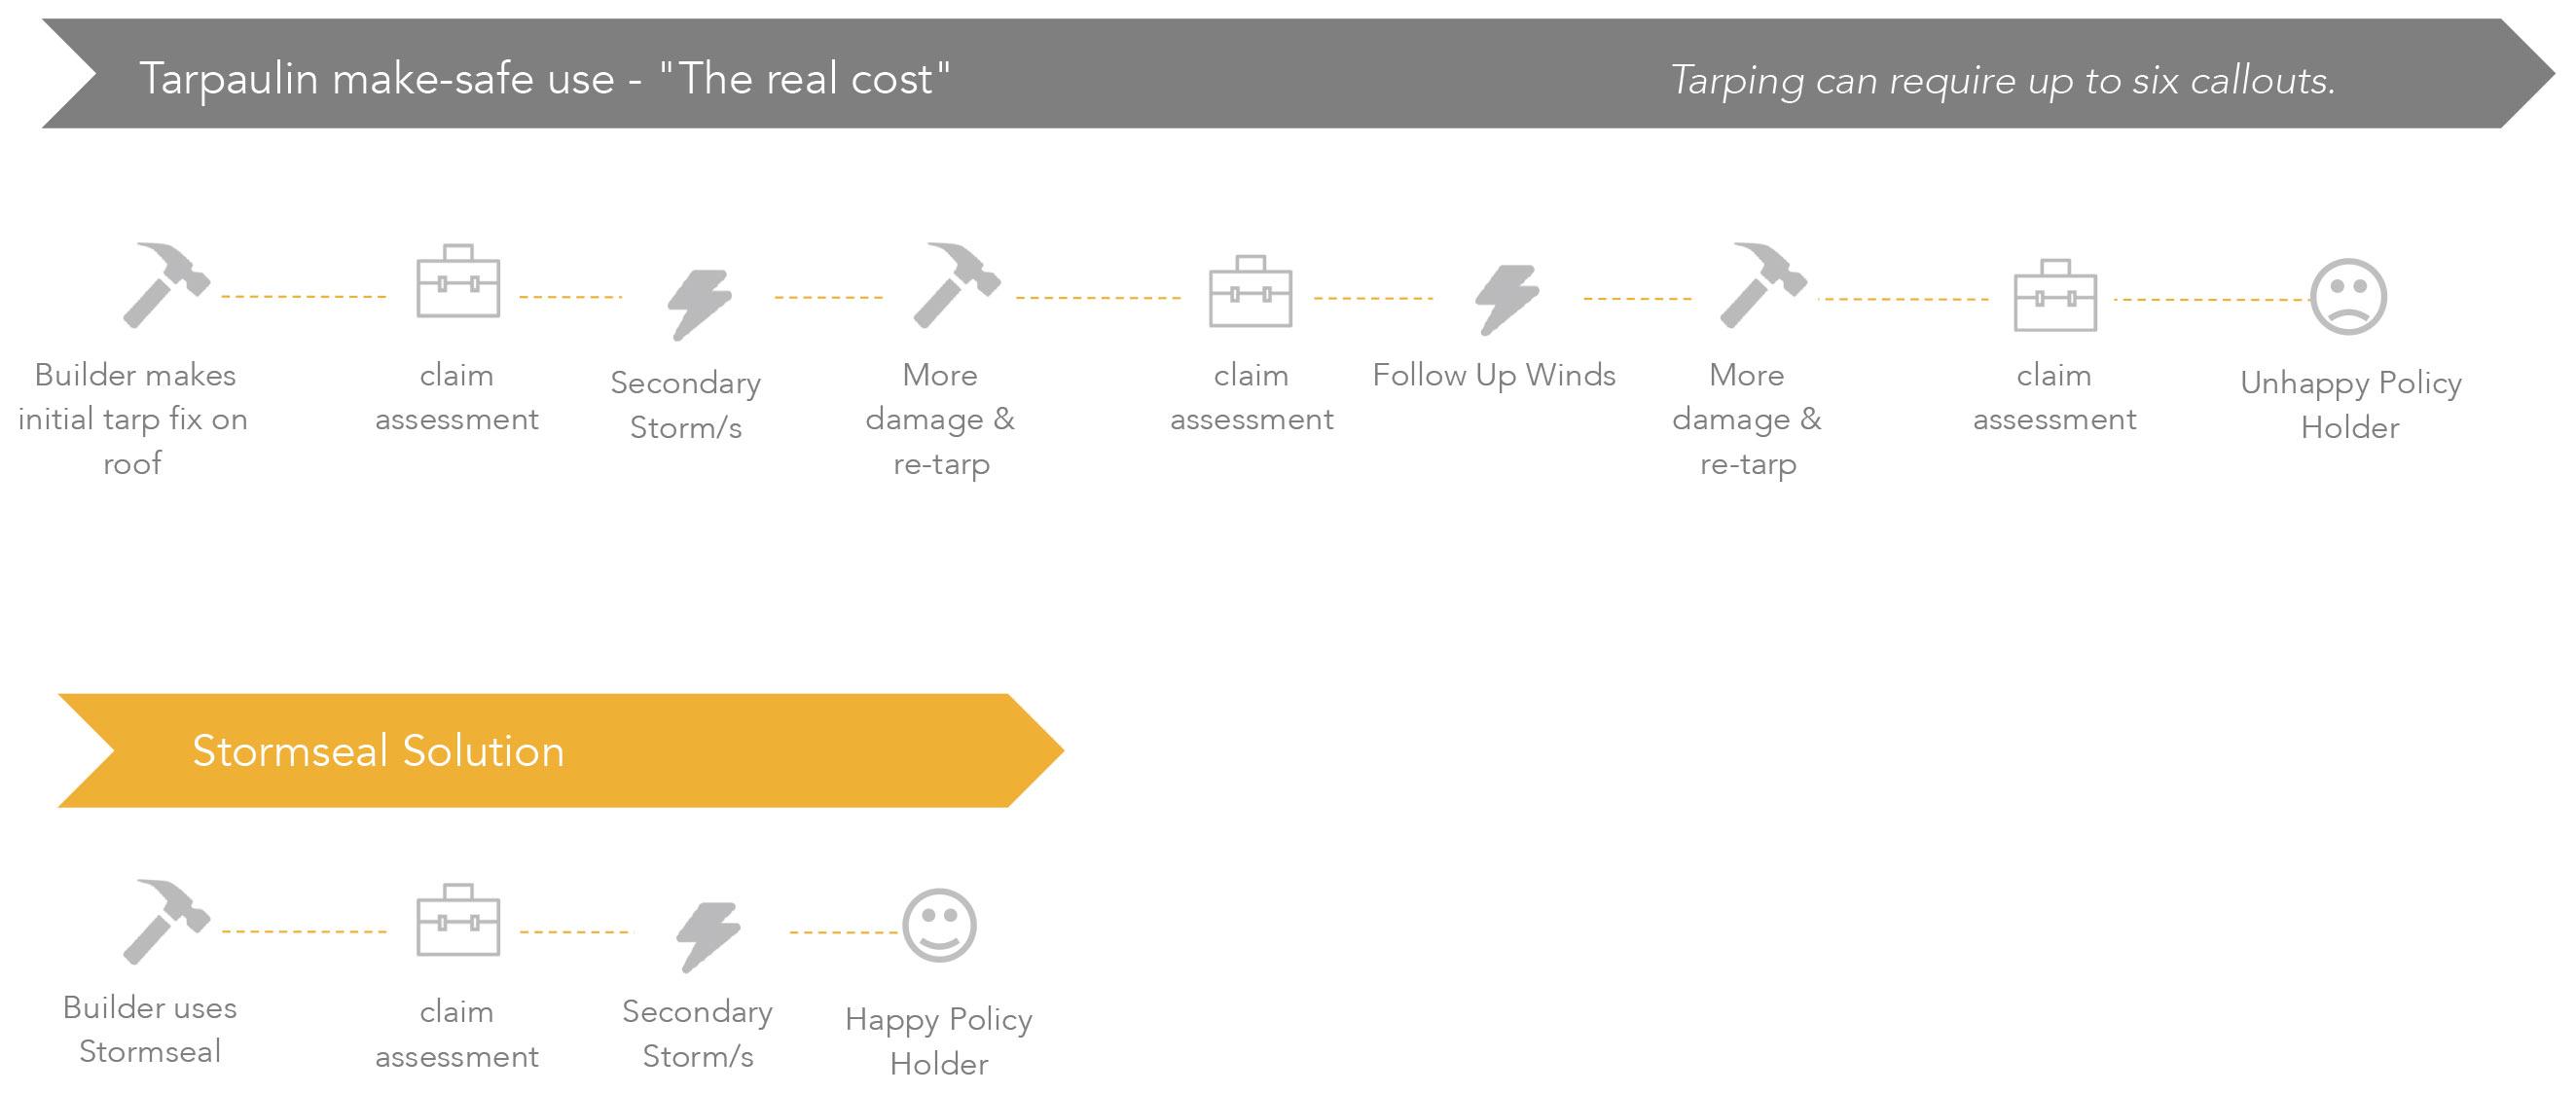 tarpaulin make safe use - stormseal solution